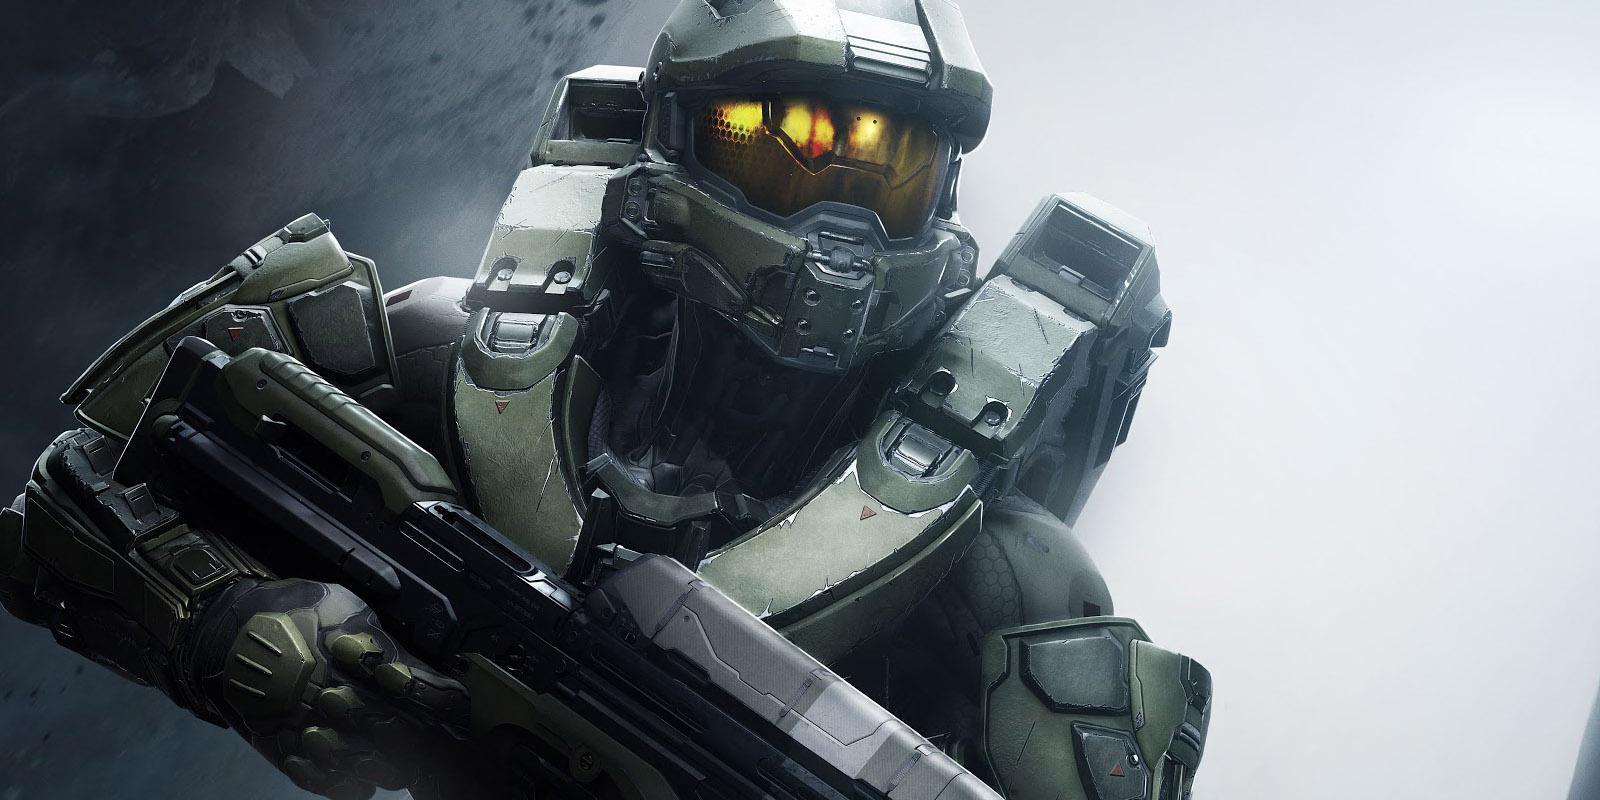 Halo 2 release date in Perth